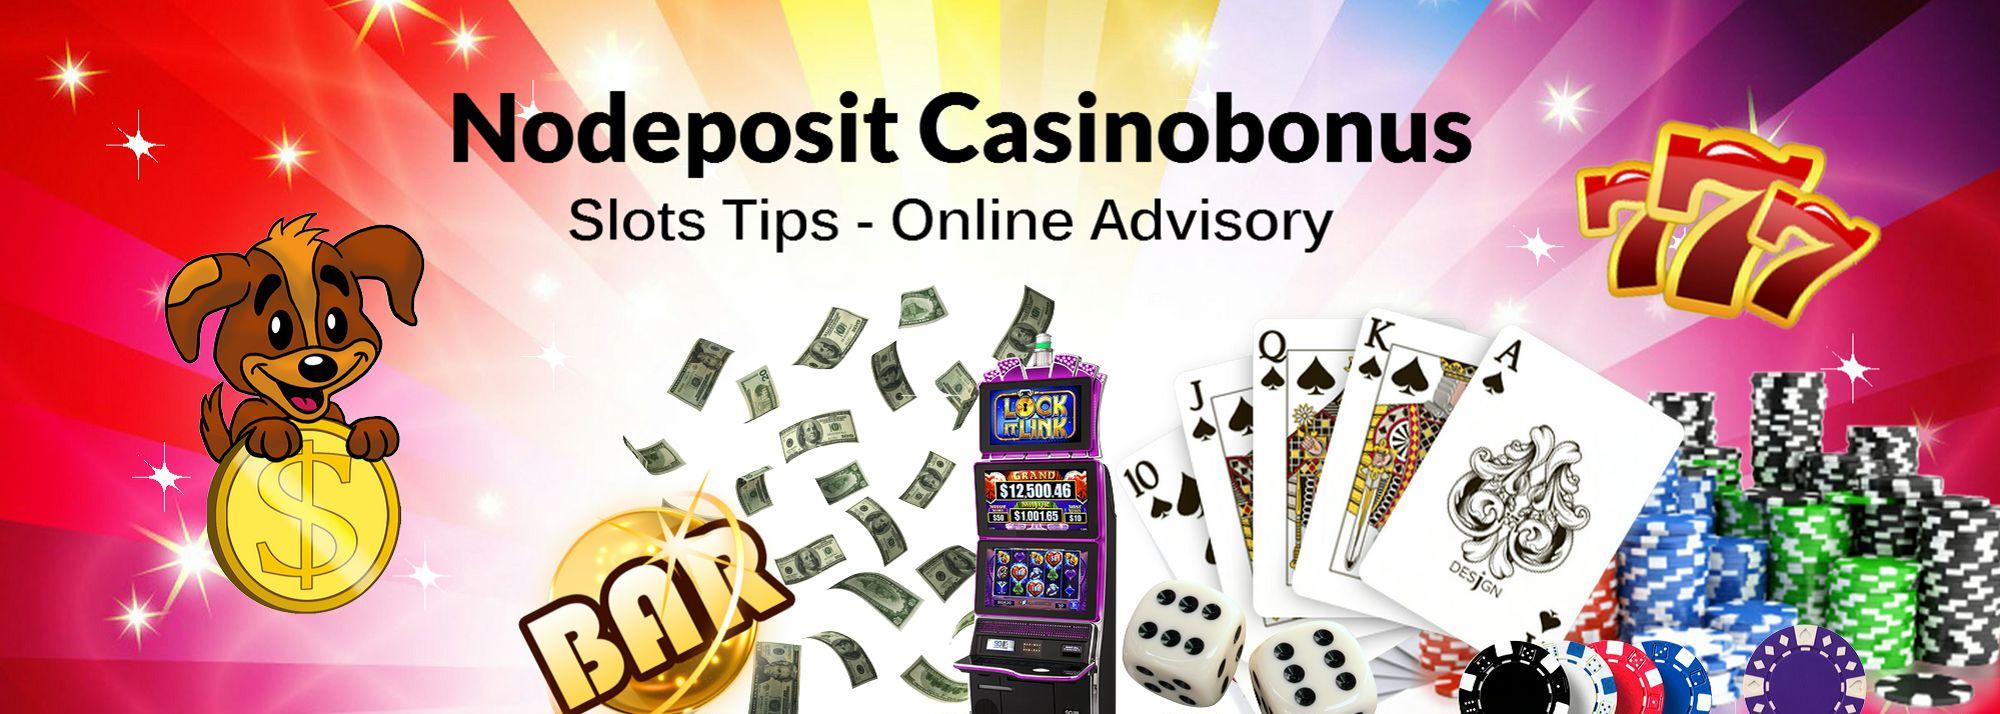 nodeposit-casino-bonus